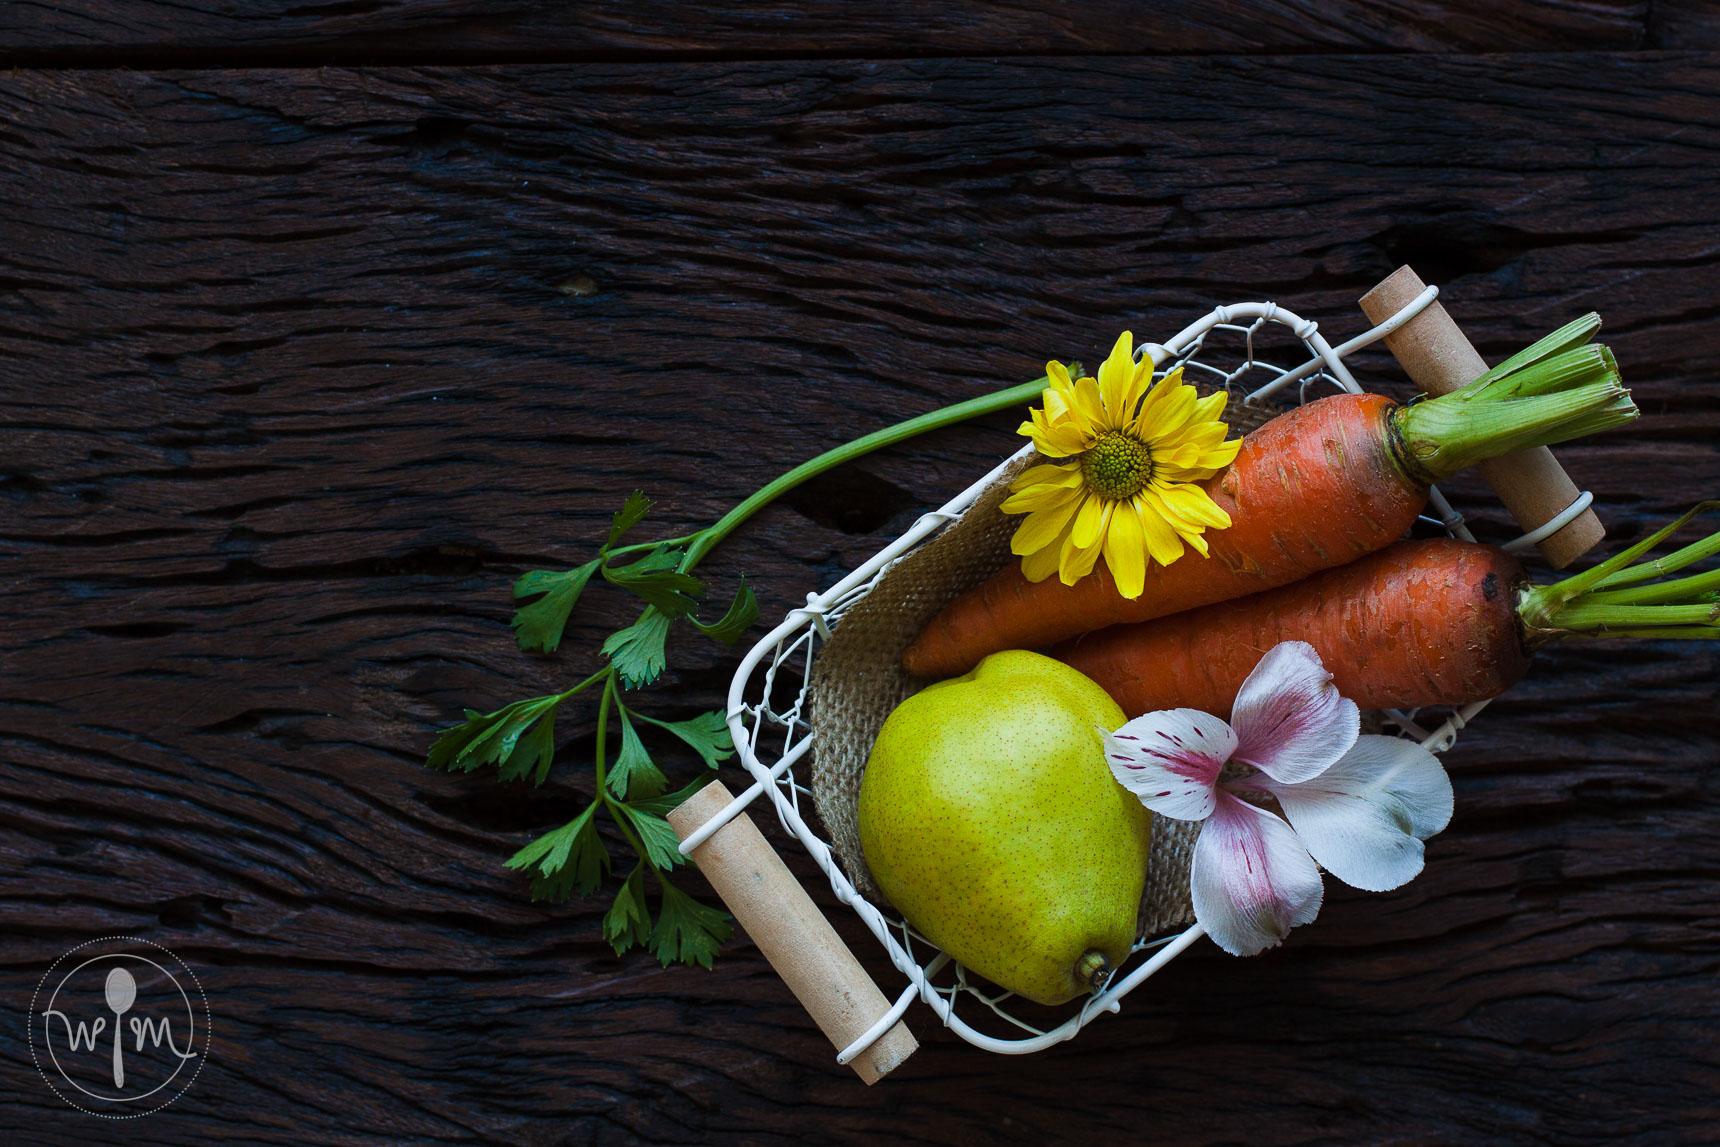 2/3 Carrots, 1/3 Pears